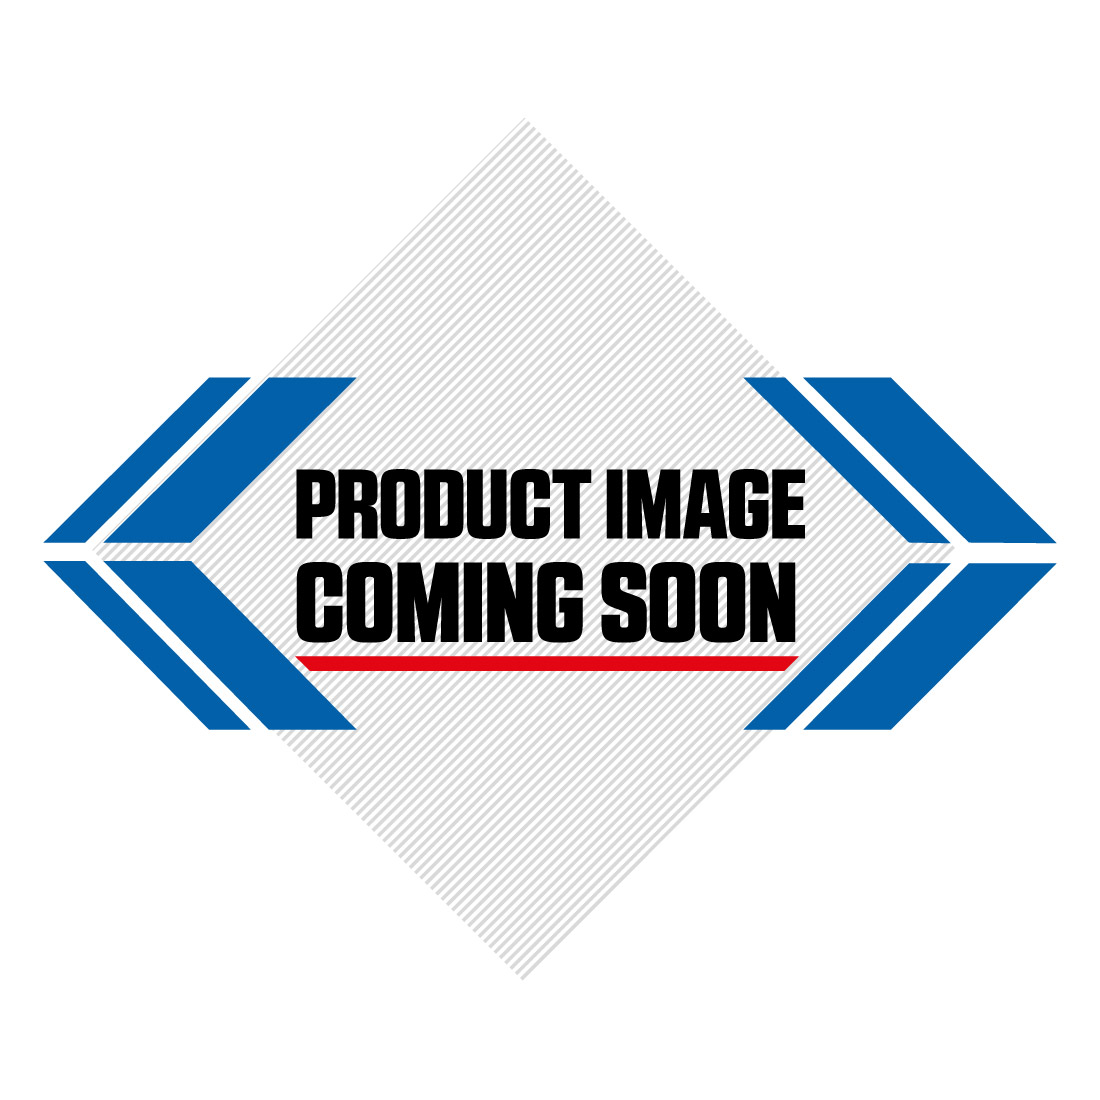 DJI Mavic Pro Platinum Drone Image-0